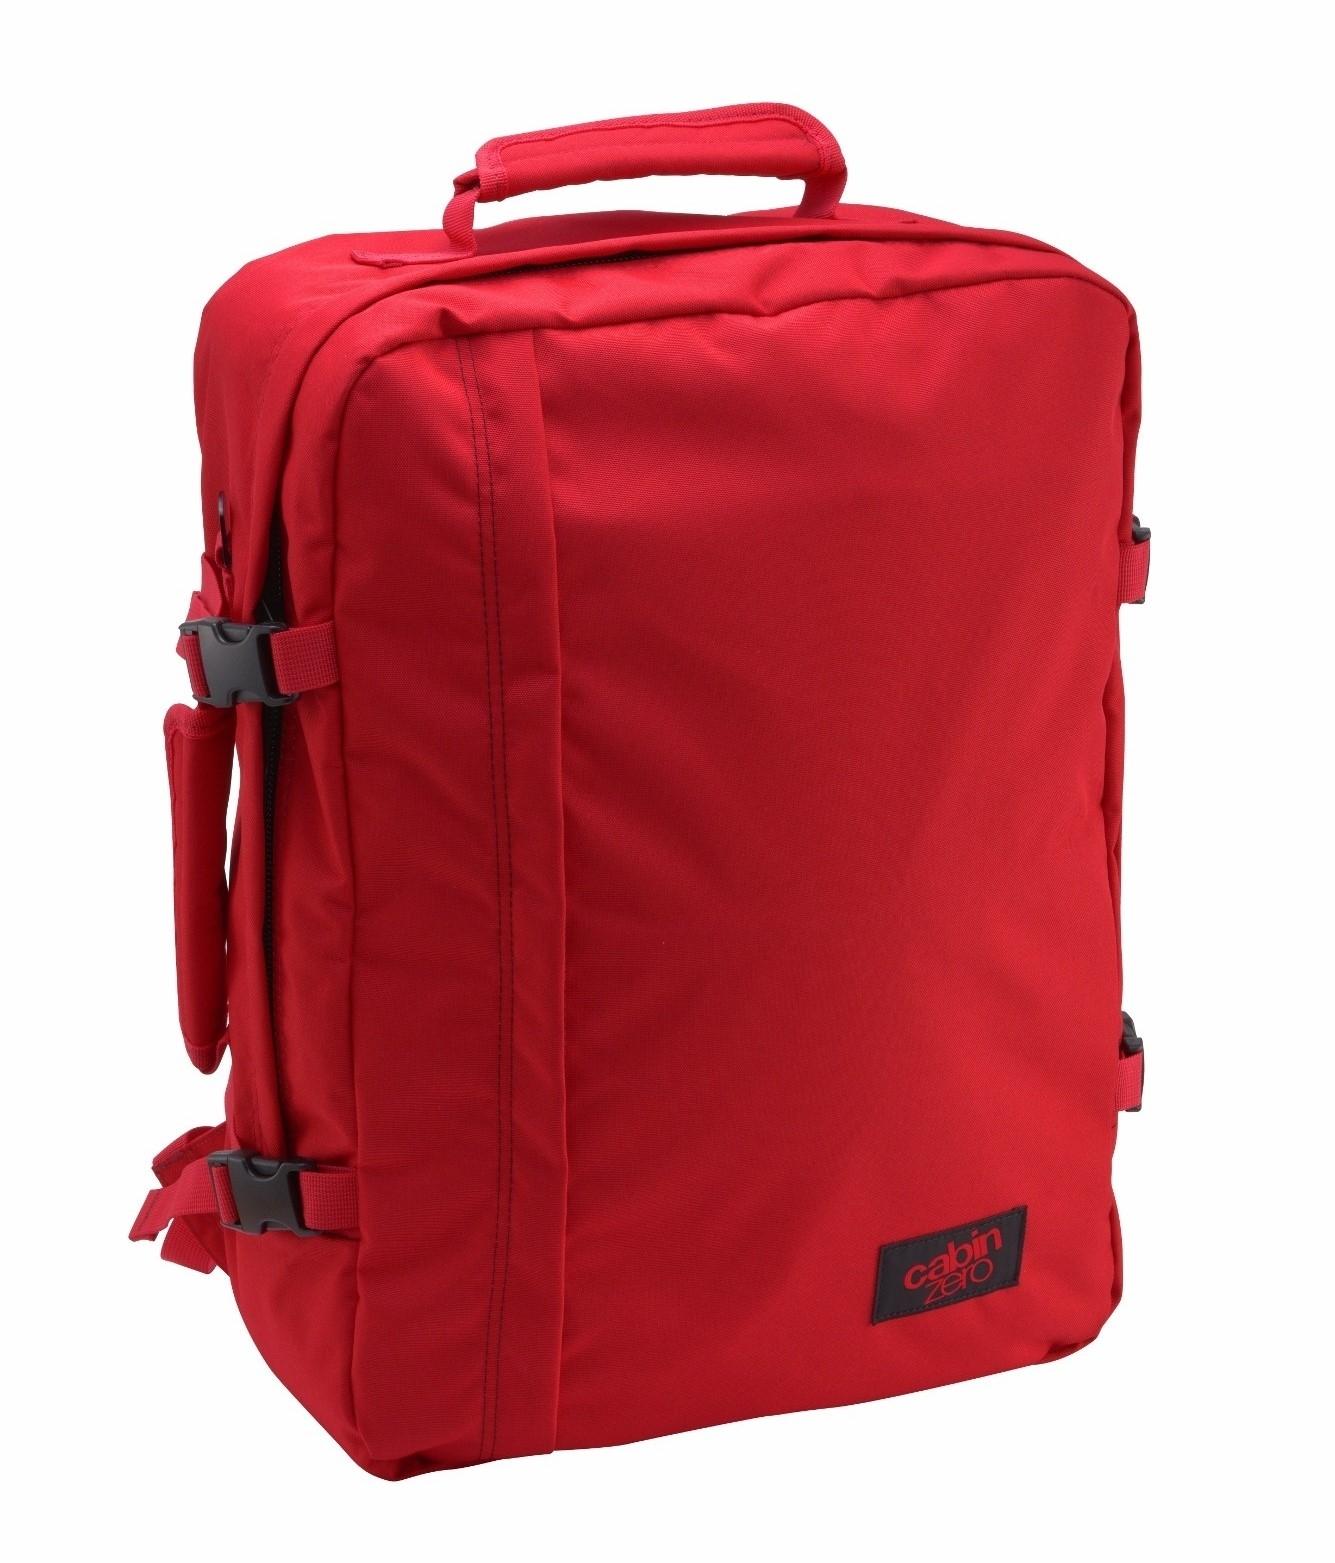 Palubní batoh jako alternativa kufru - Poradna  a9c095fbc2